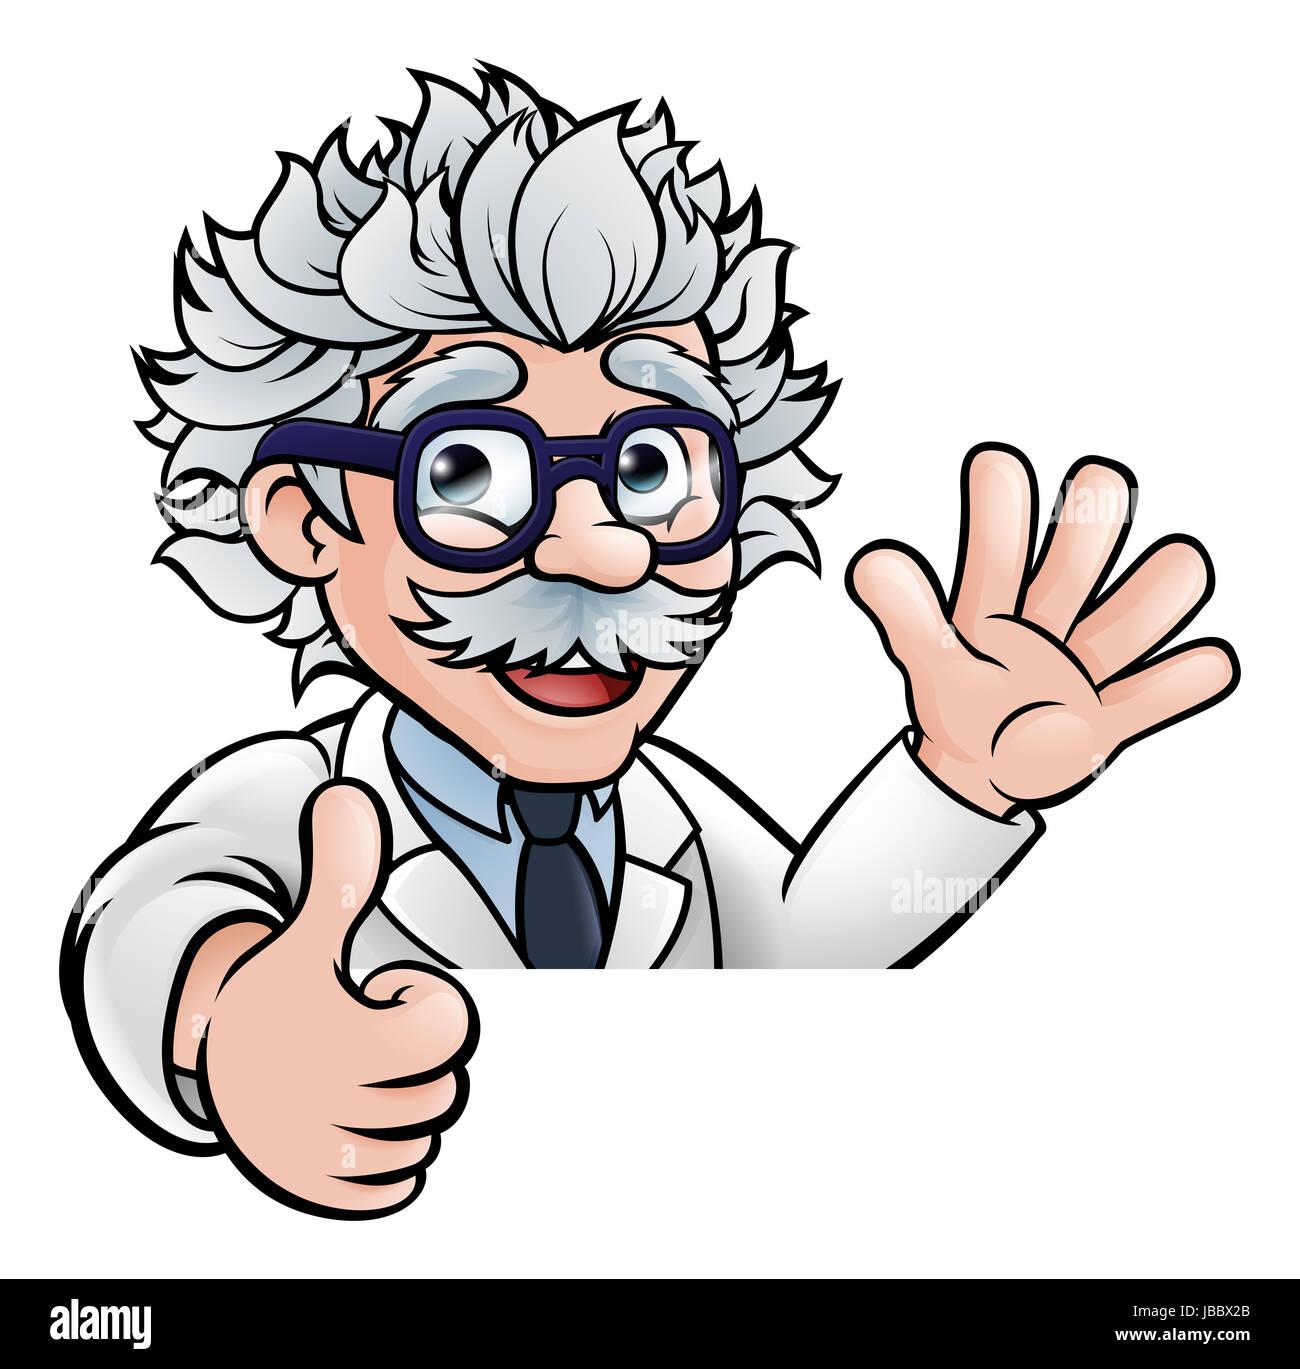 Cartoon Mad Scientist Black and White Stock Photos